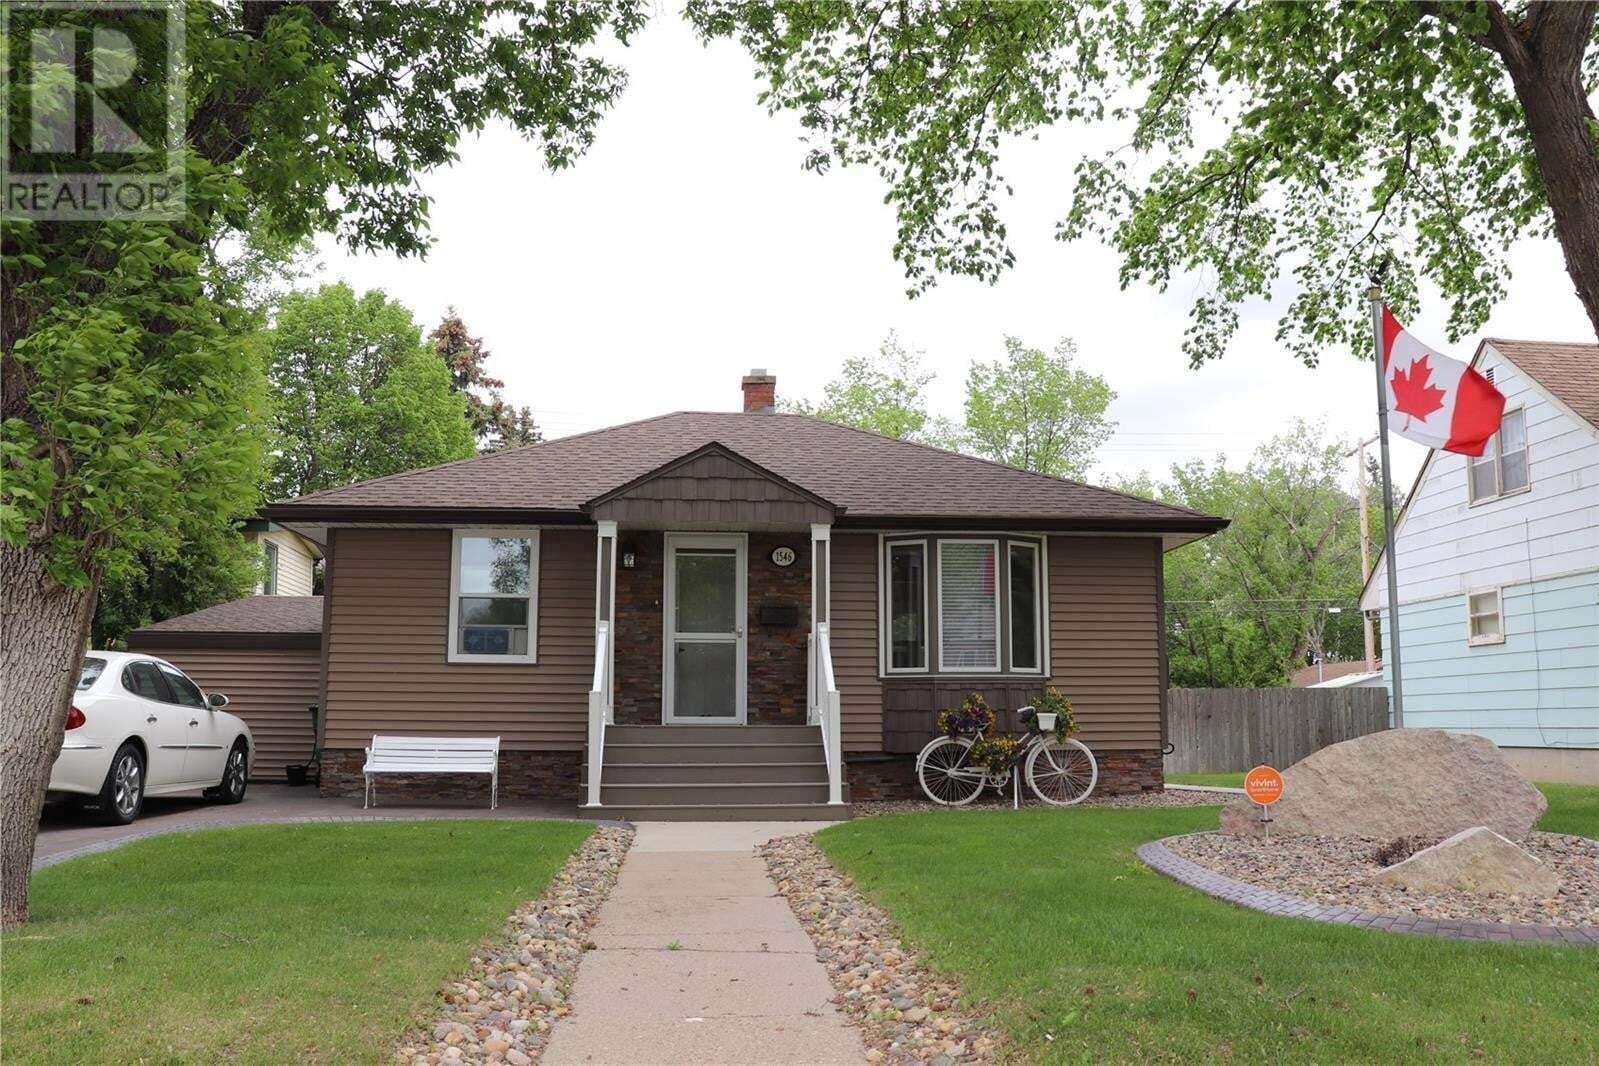 House for sale at 1546 10th Ave N Saskatoon Saskatchewan - MLS: SK817356